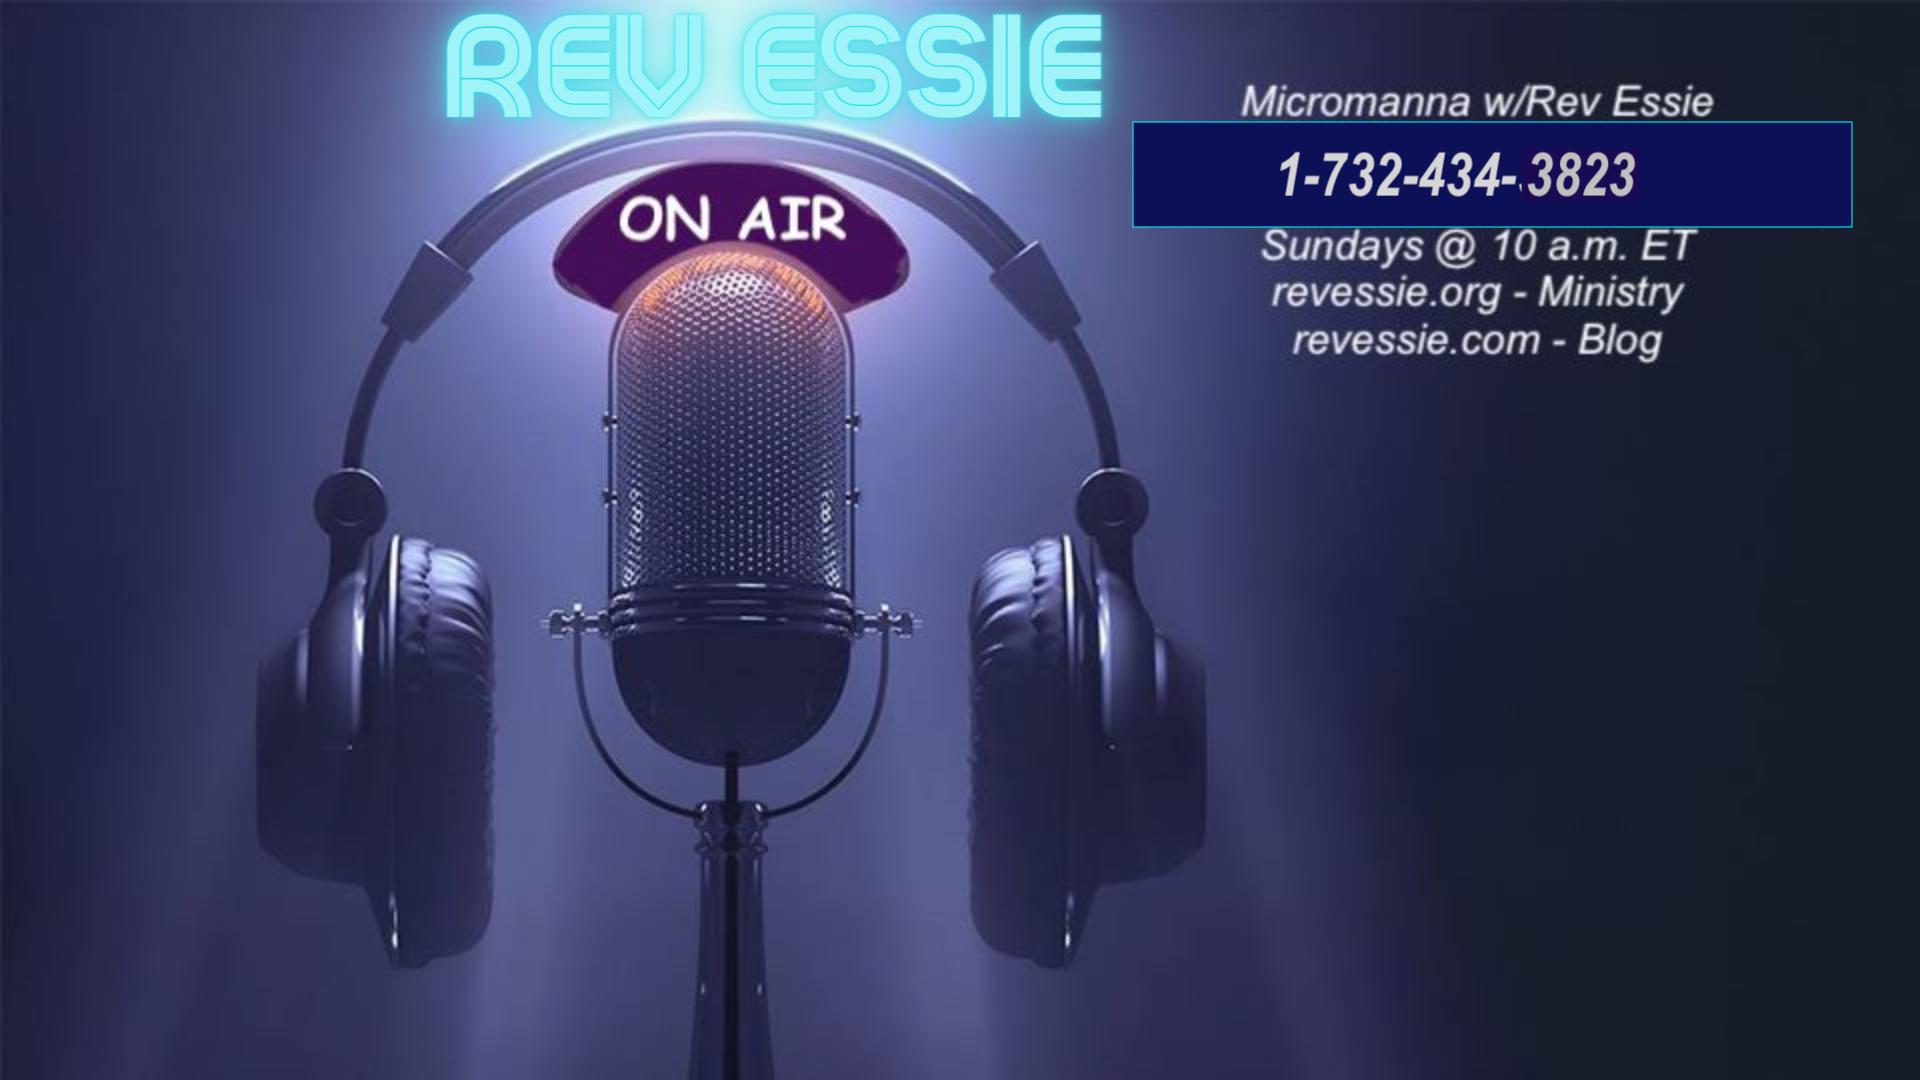 rev-essie-on-air-100921-1